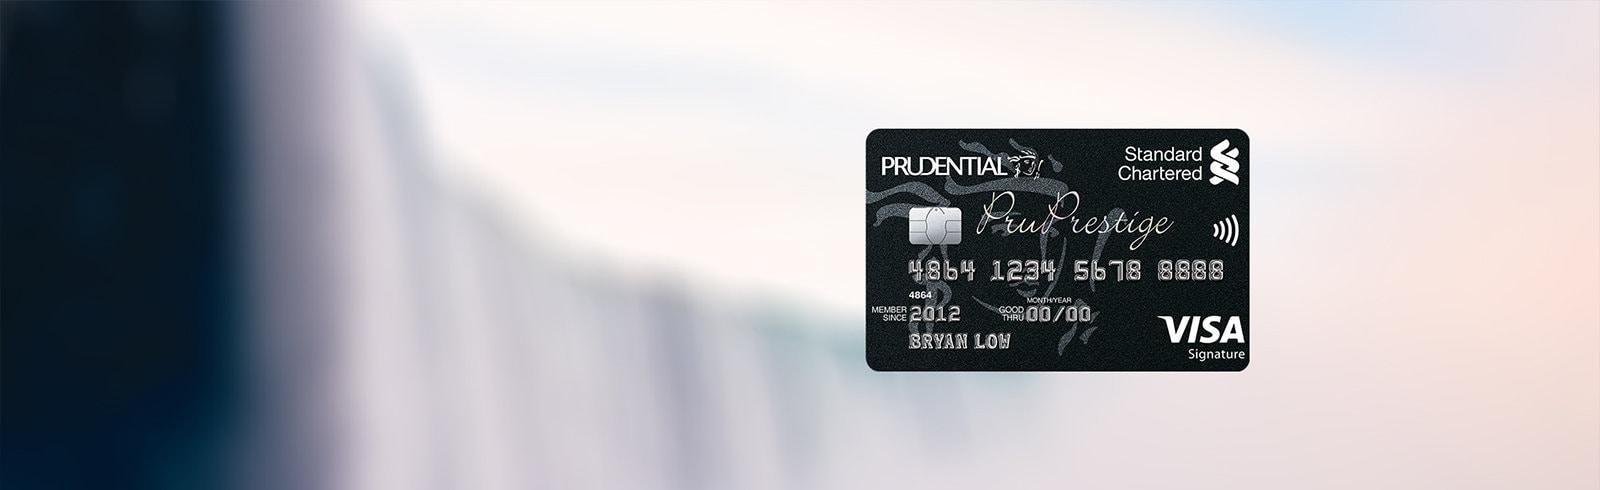 SG PruPrestige Credit Card